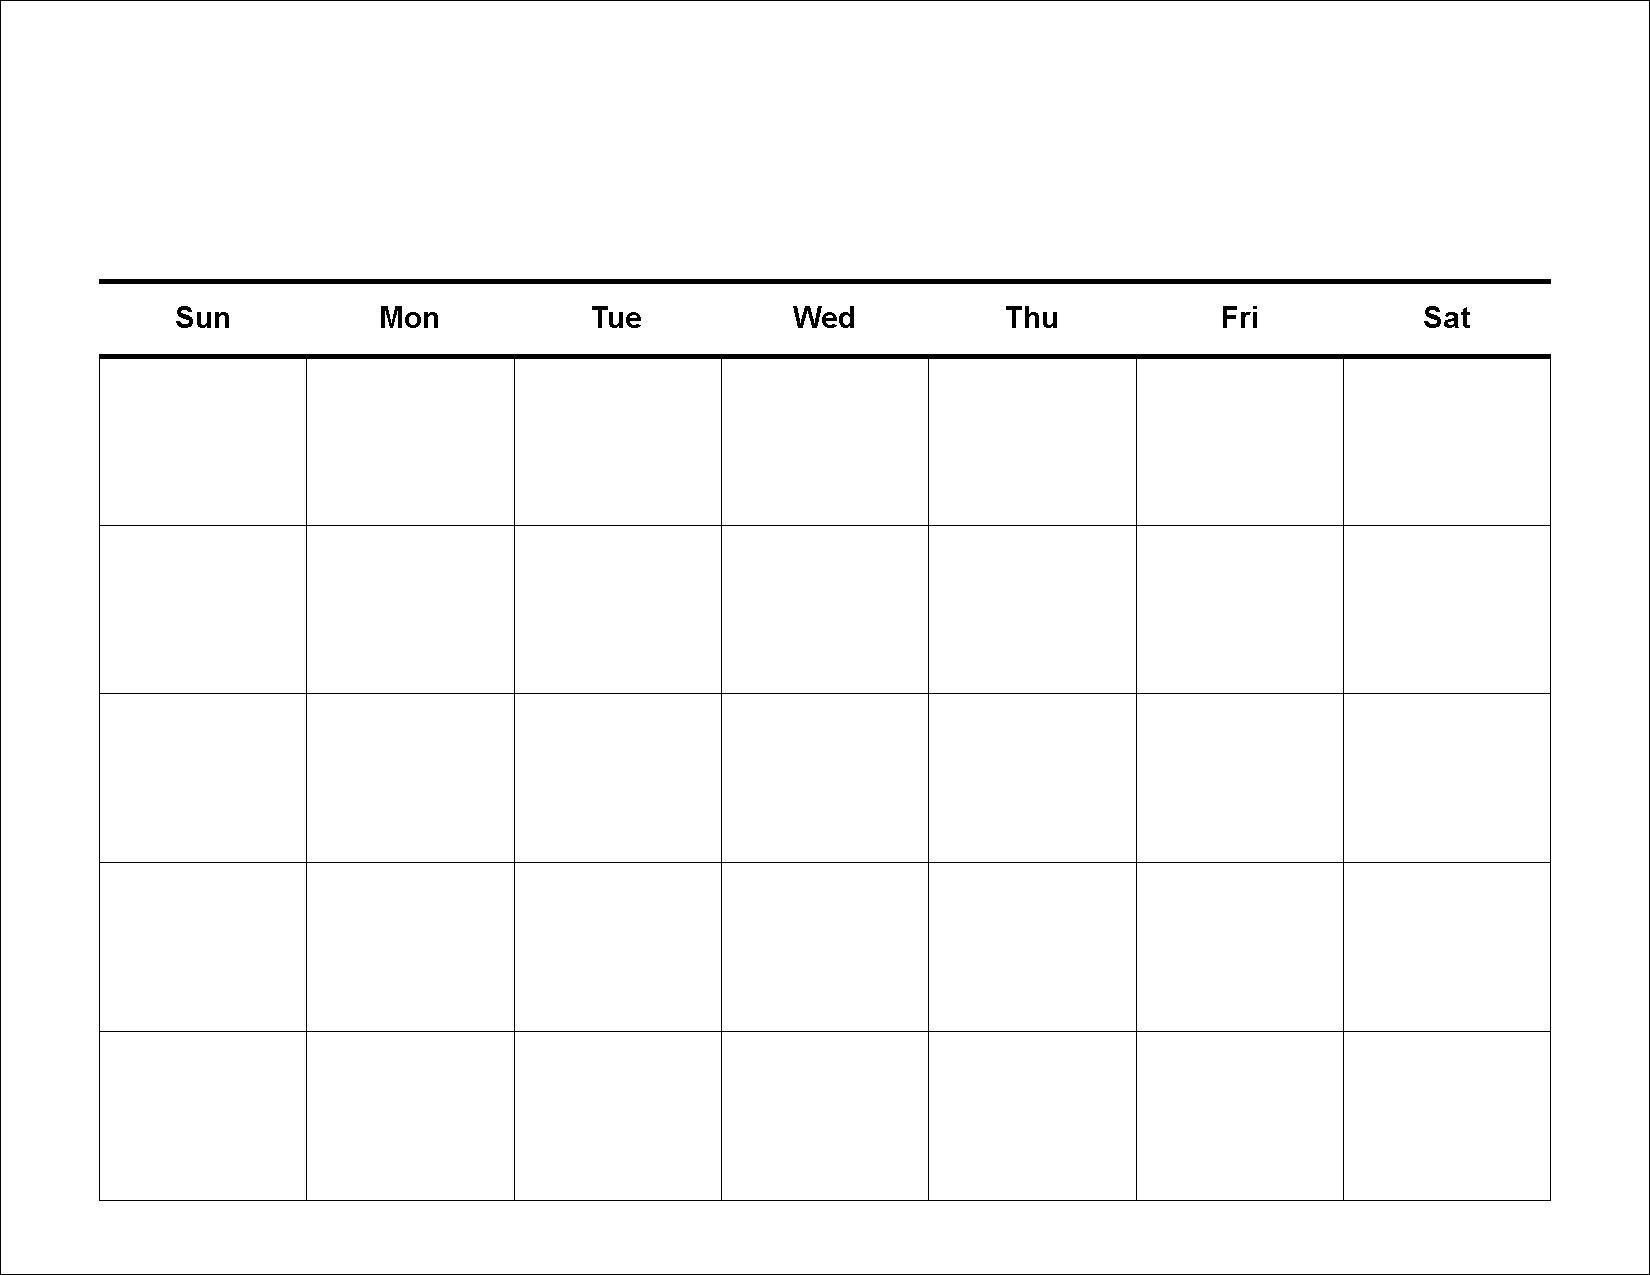 30-Day-Calendar-Template-Printable-Large regarding Free Printable Blank Calendars To Fill In